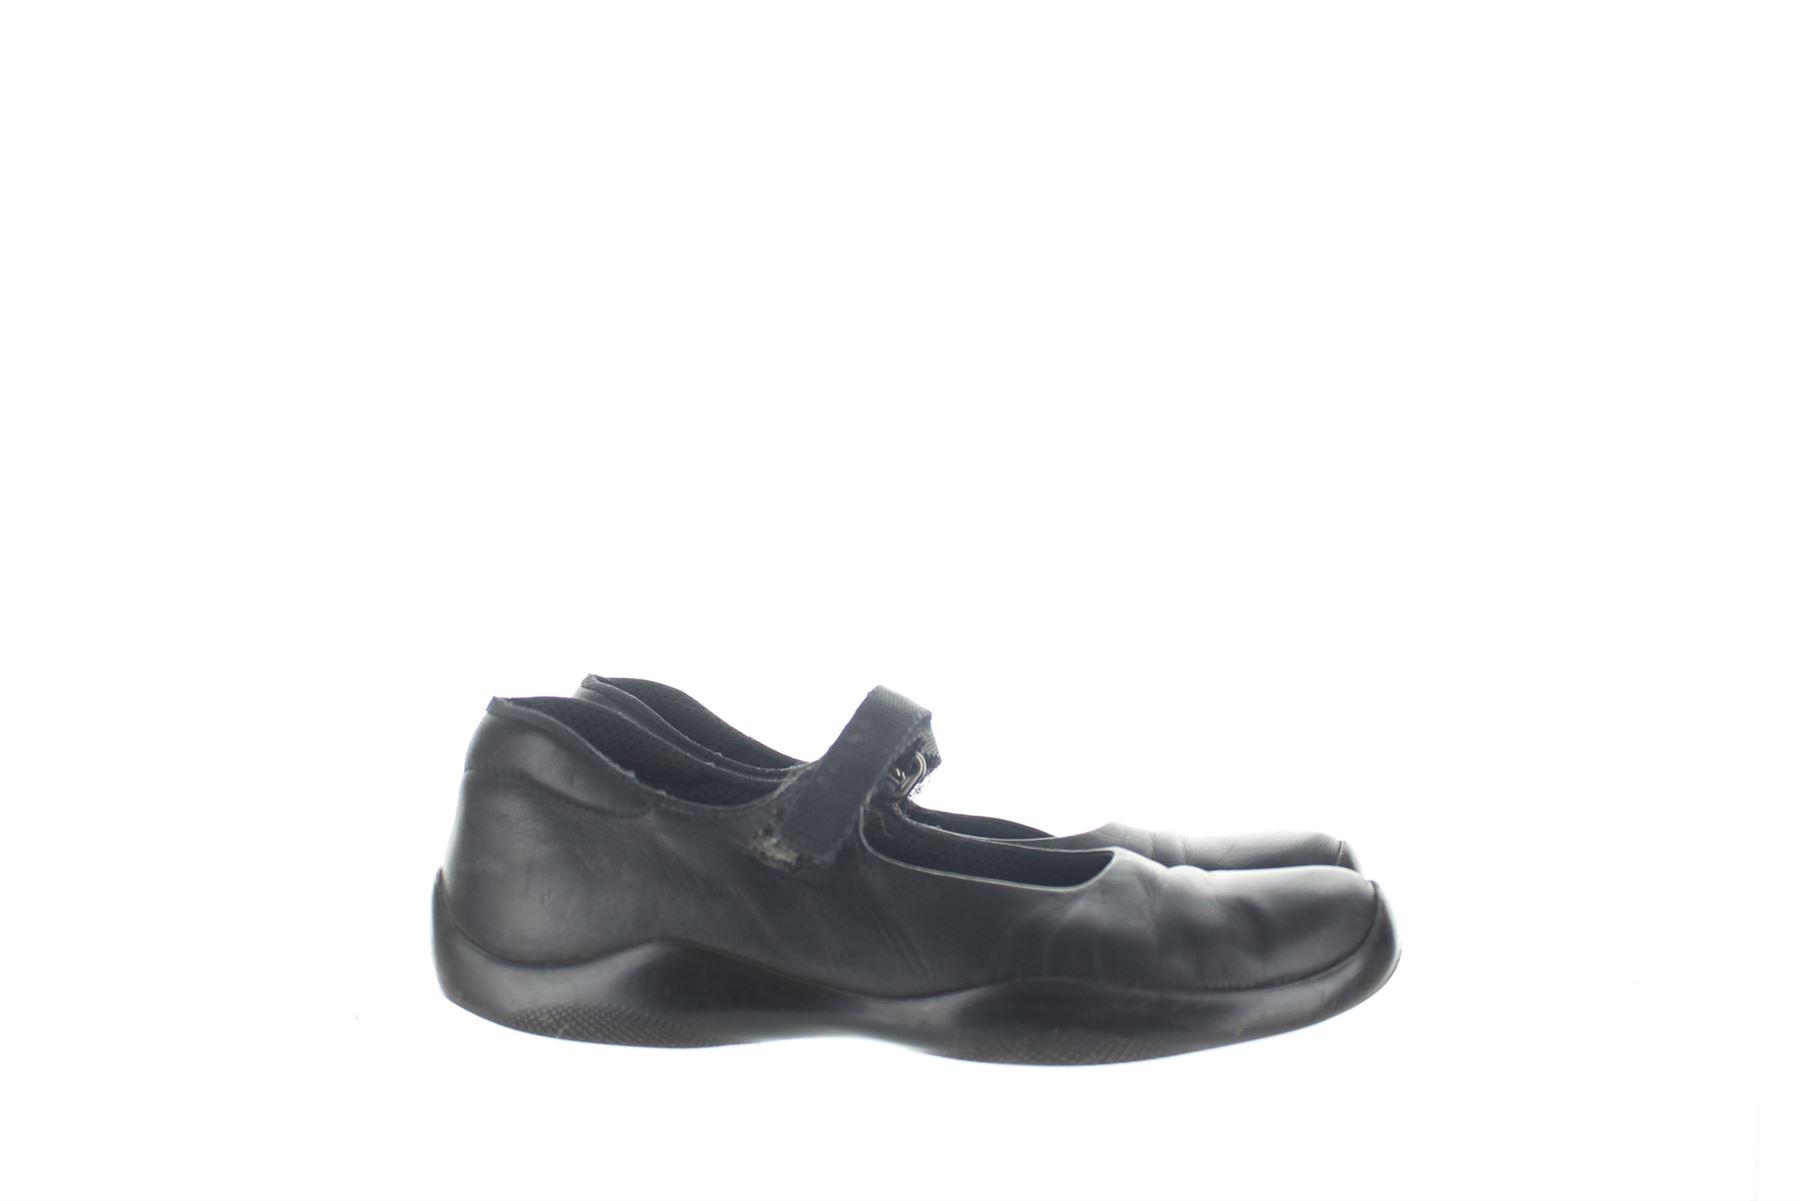 PRADA Scarpe Cinturino in pelle nera, US EU 6.5 e1d843 EU US 36.5 e1d843 6.5   9eecd7